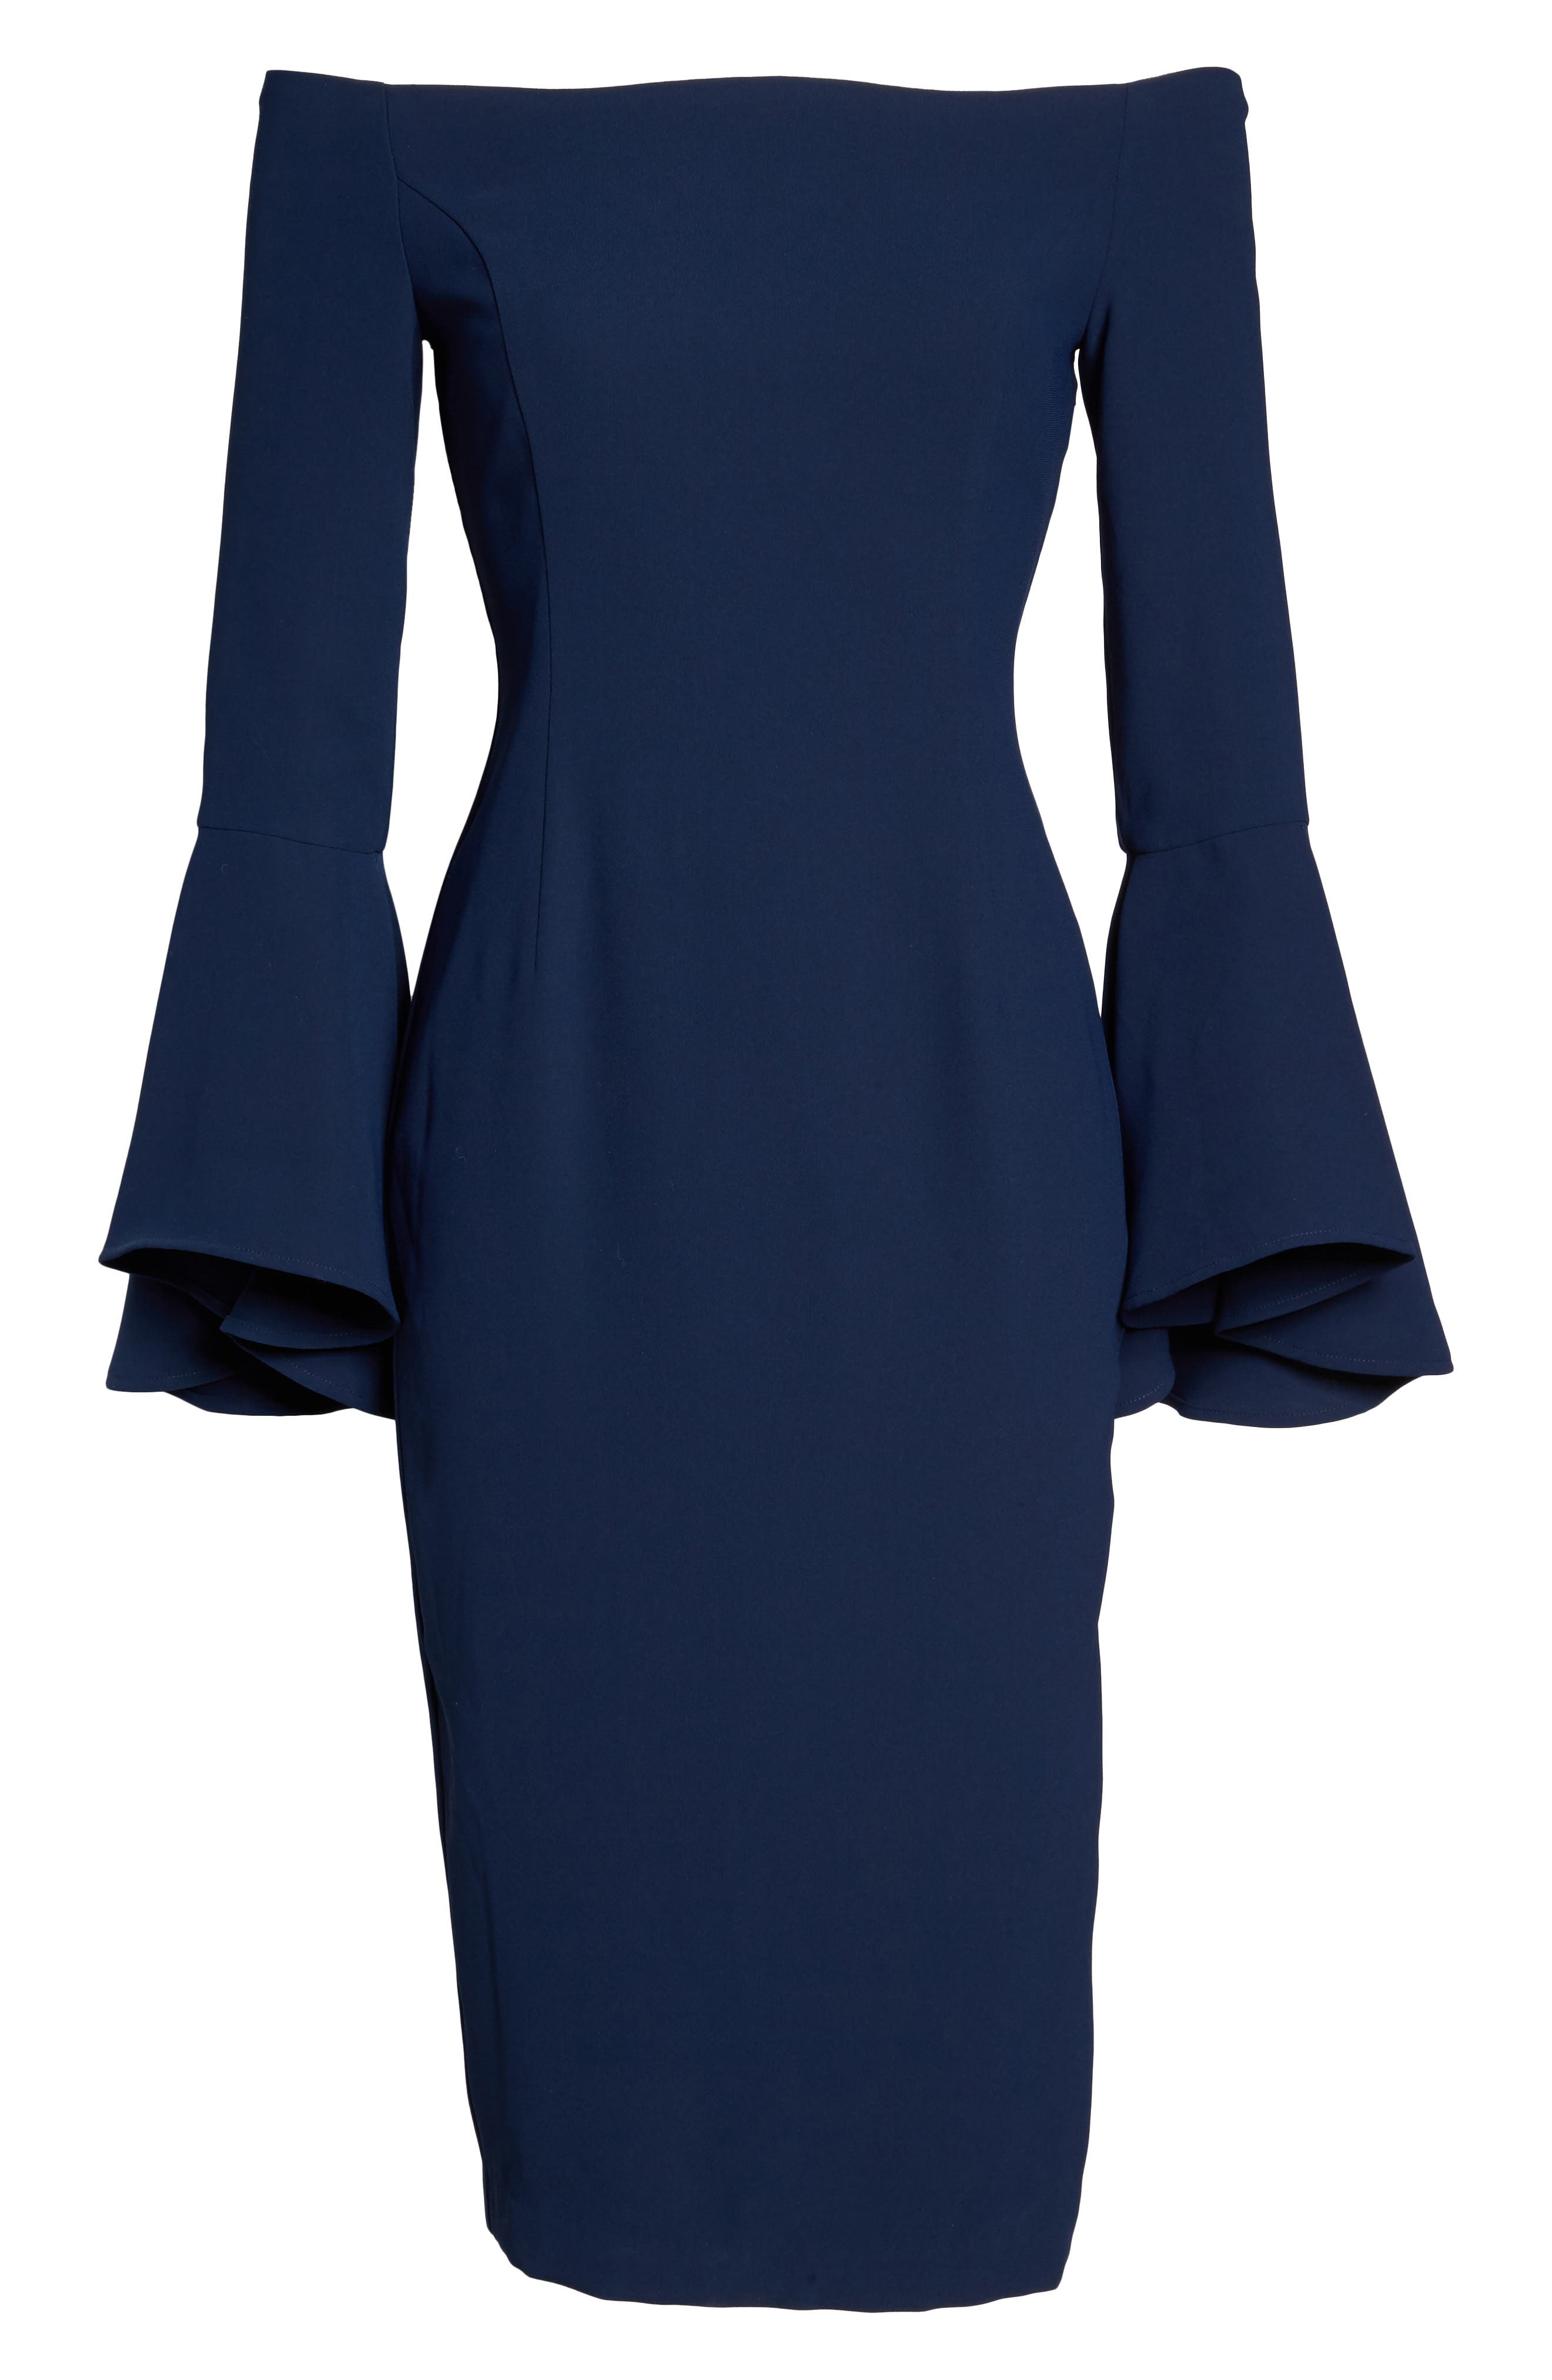 'Solange' Off the Shoulder Midi Dress,                             Alternate thumbnail 21, color,